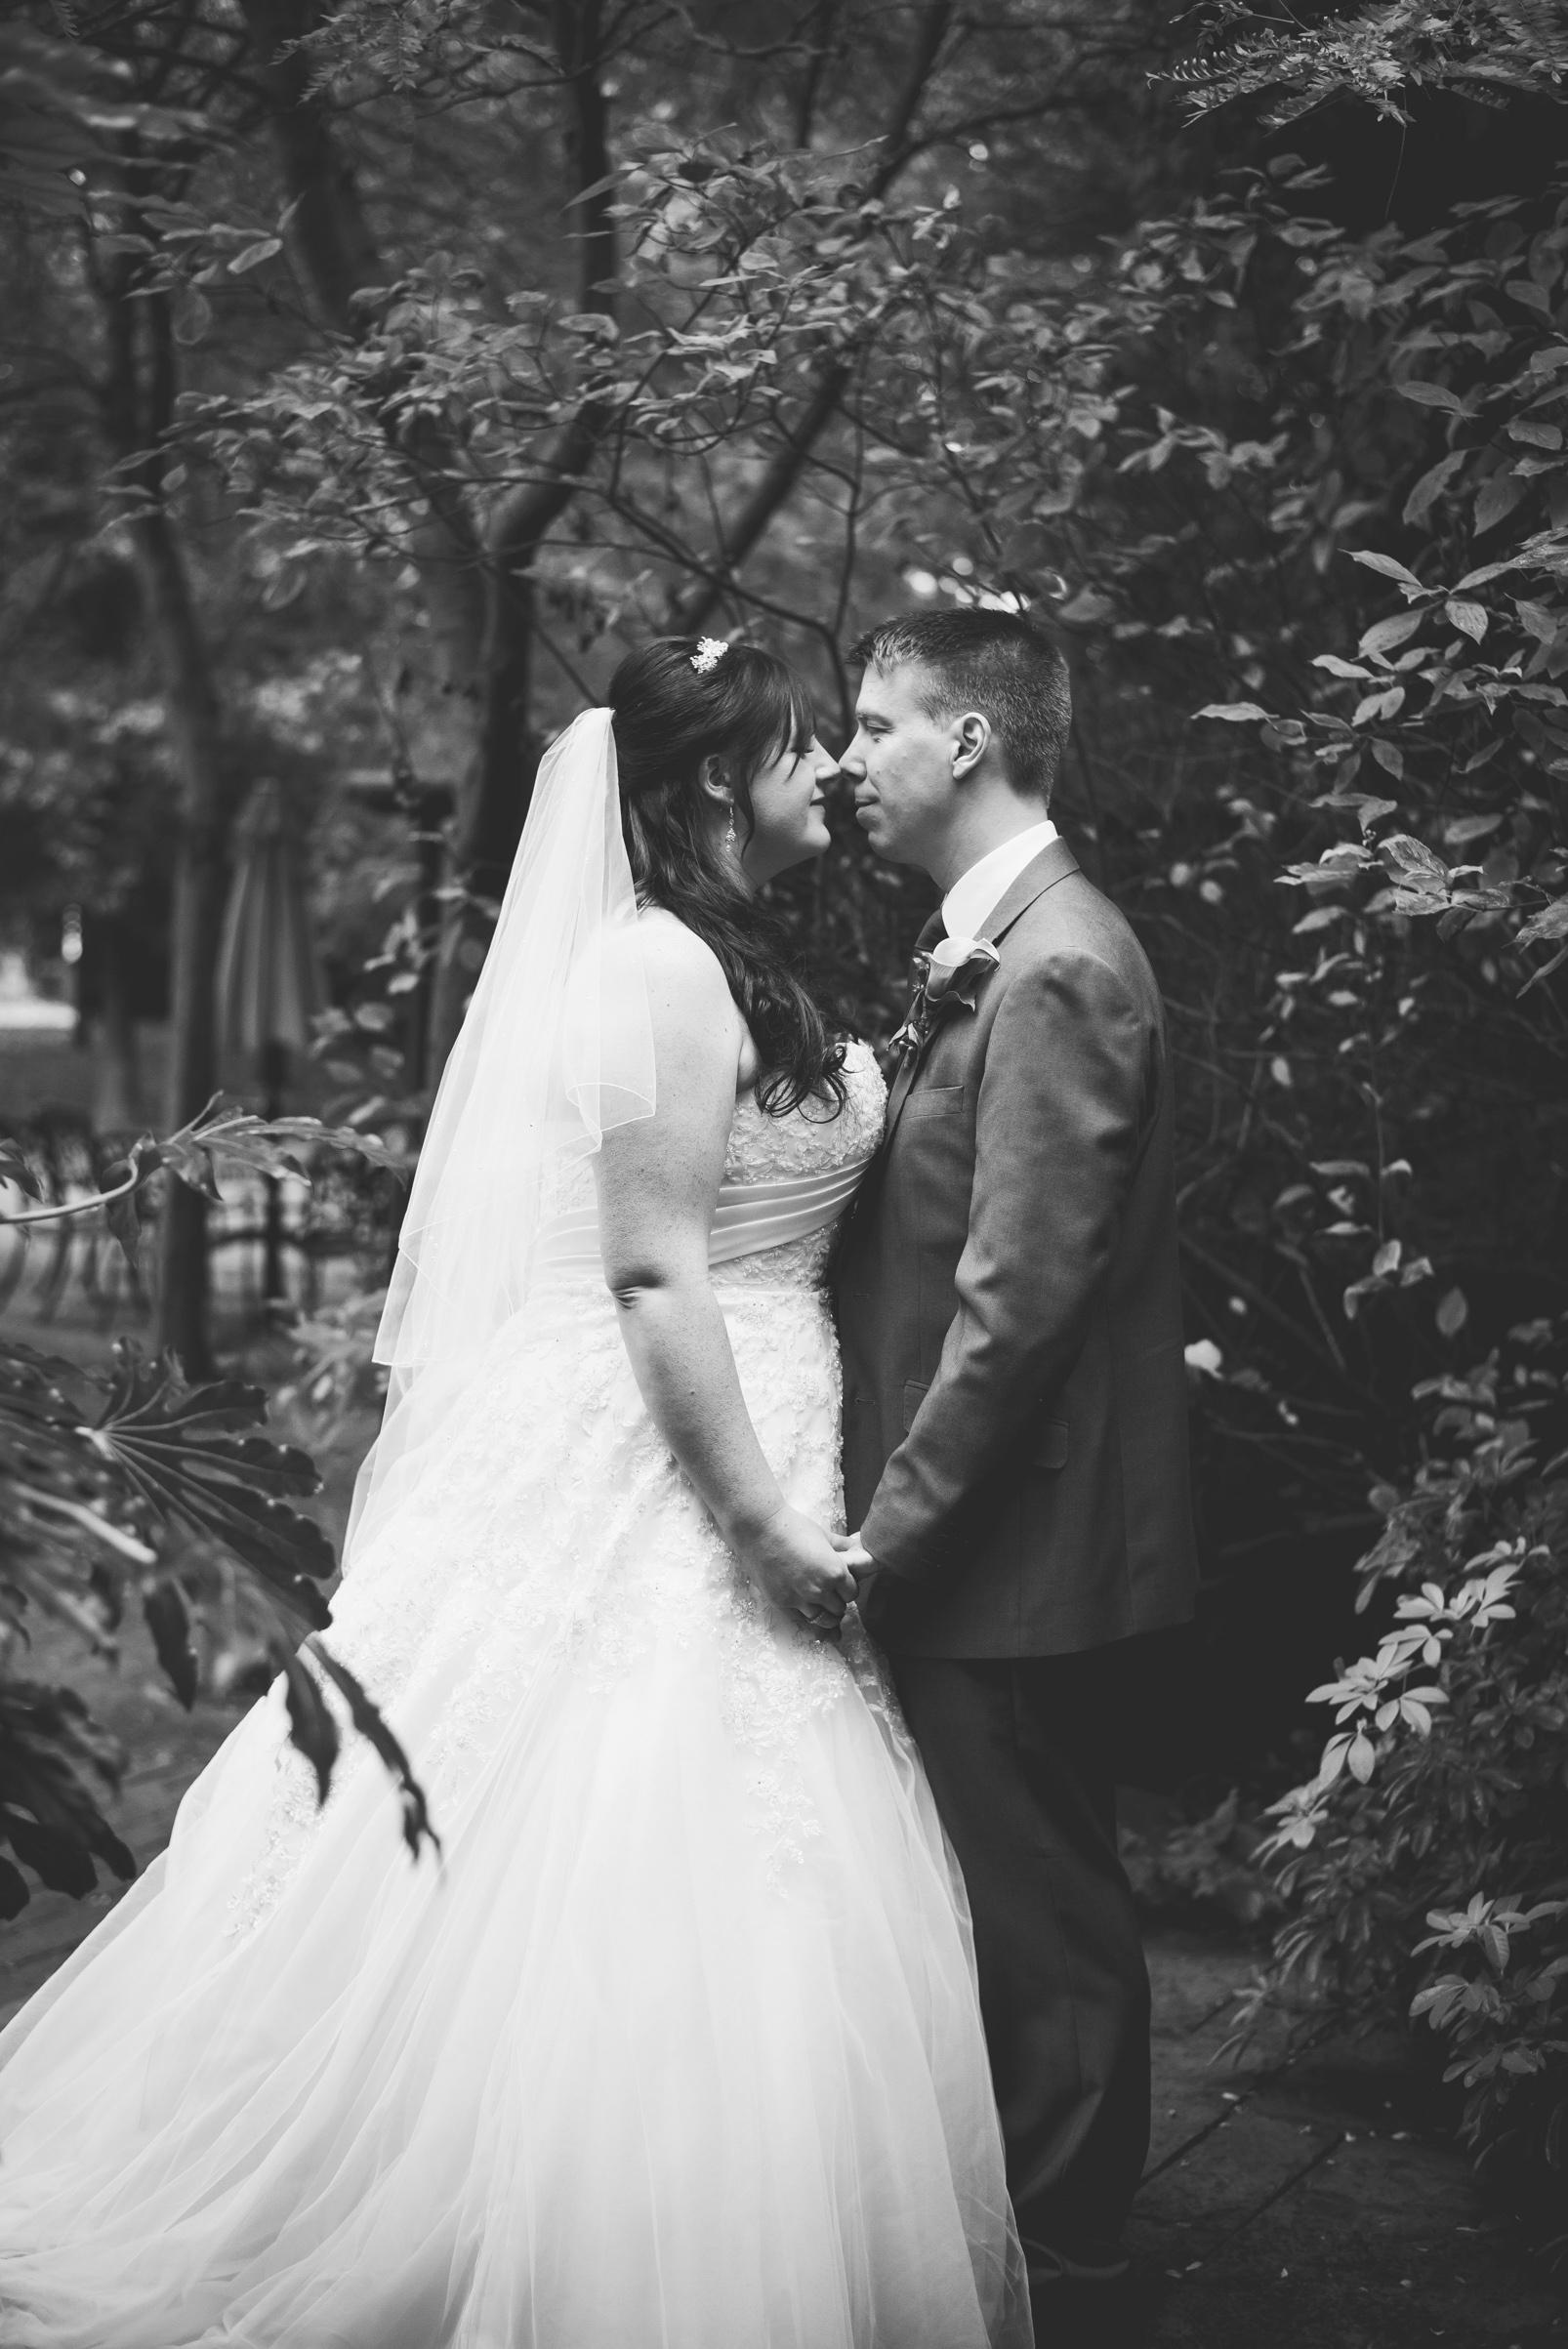 The+Fairlawns+wedding+Aldridge+StLukes+Church-165.jpg